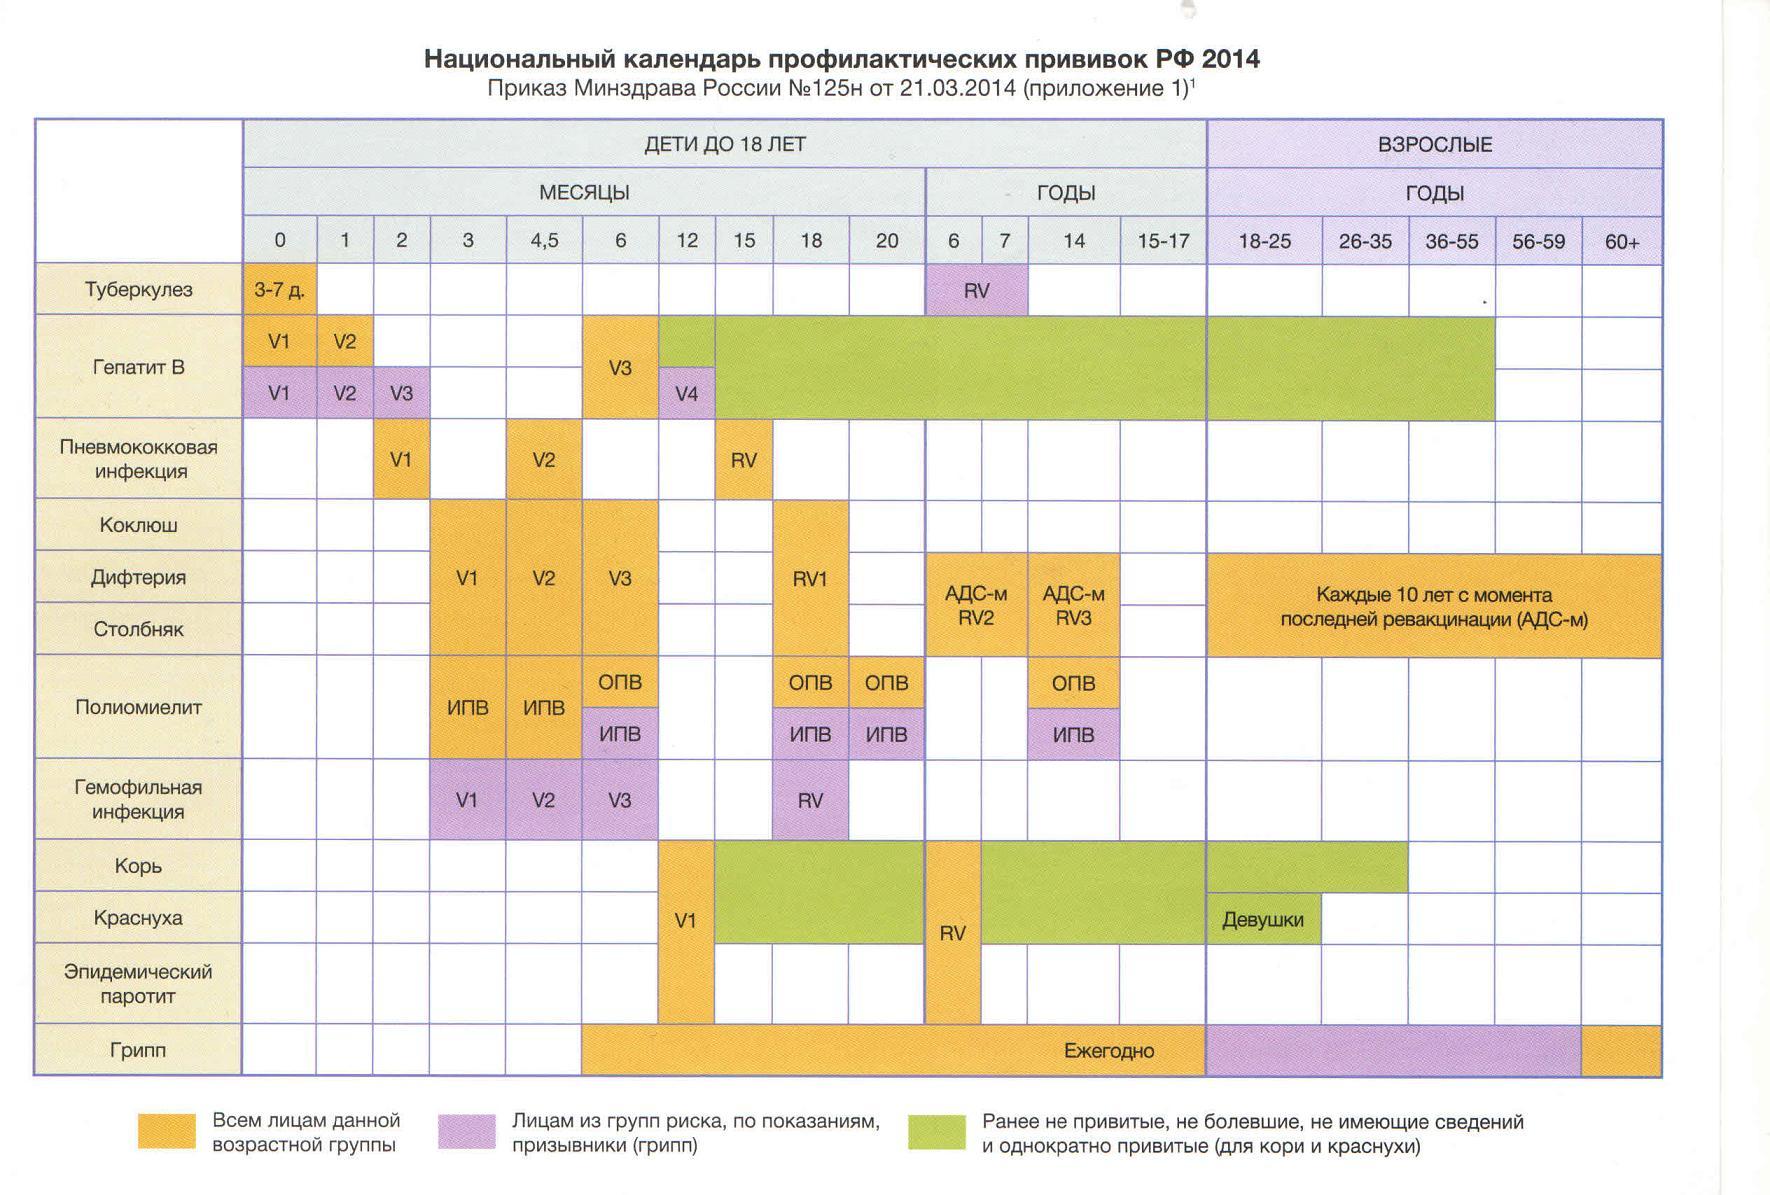 Natcionalnyi-kalendar-prof.privivok-2014 (1)